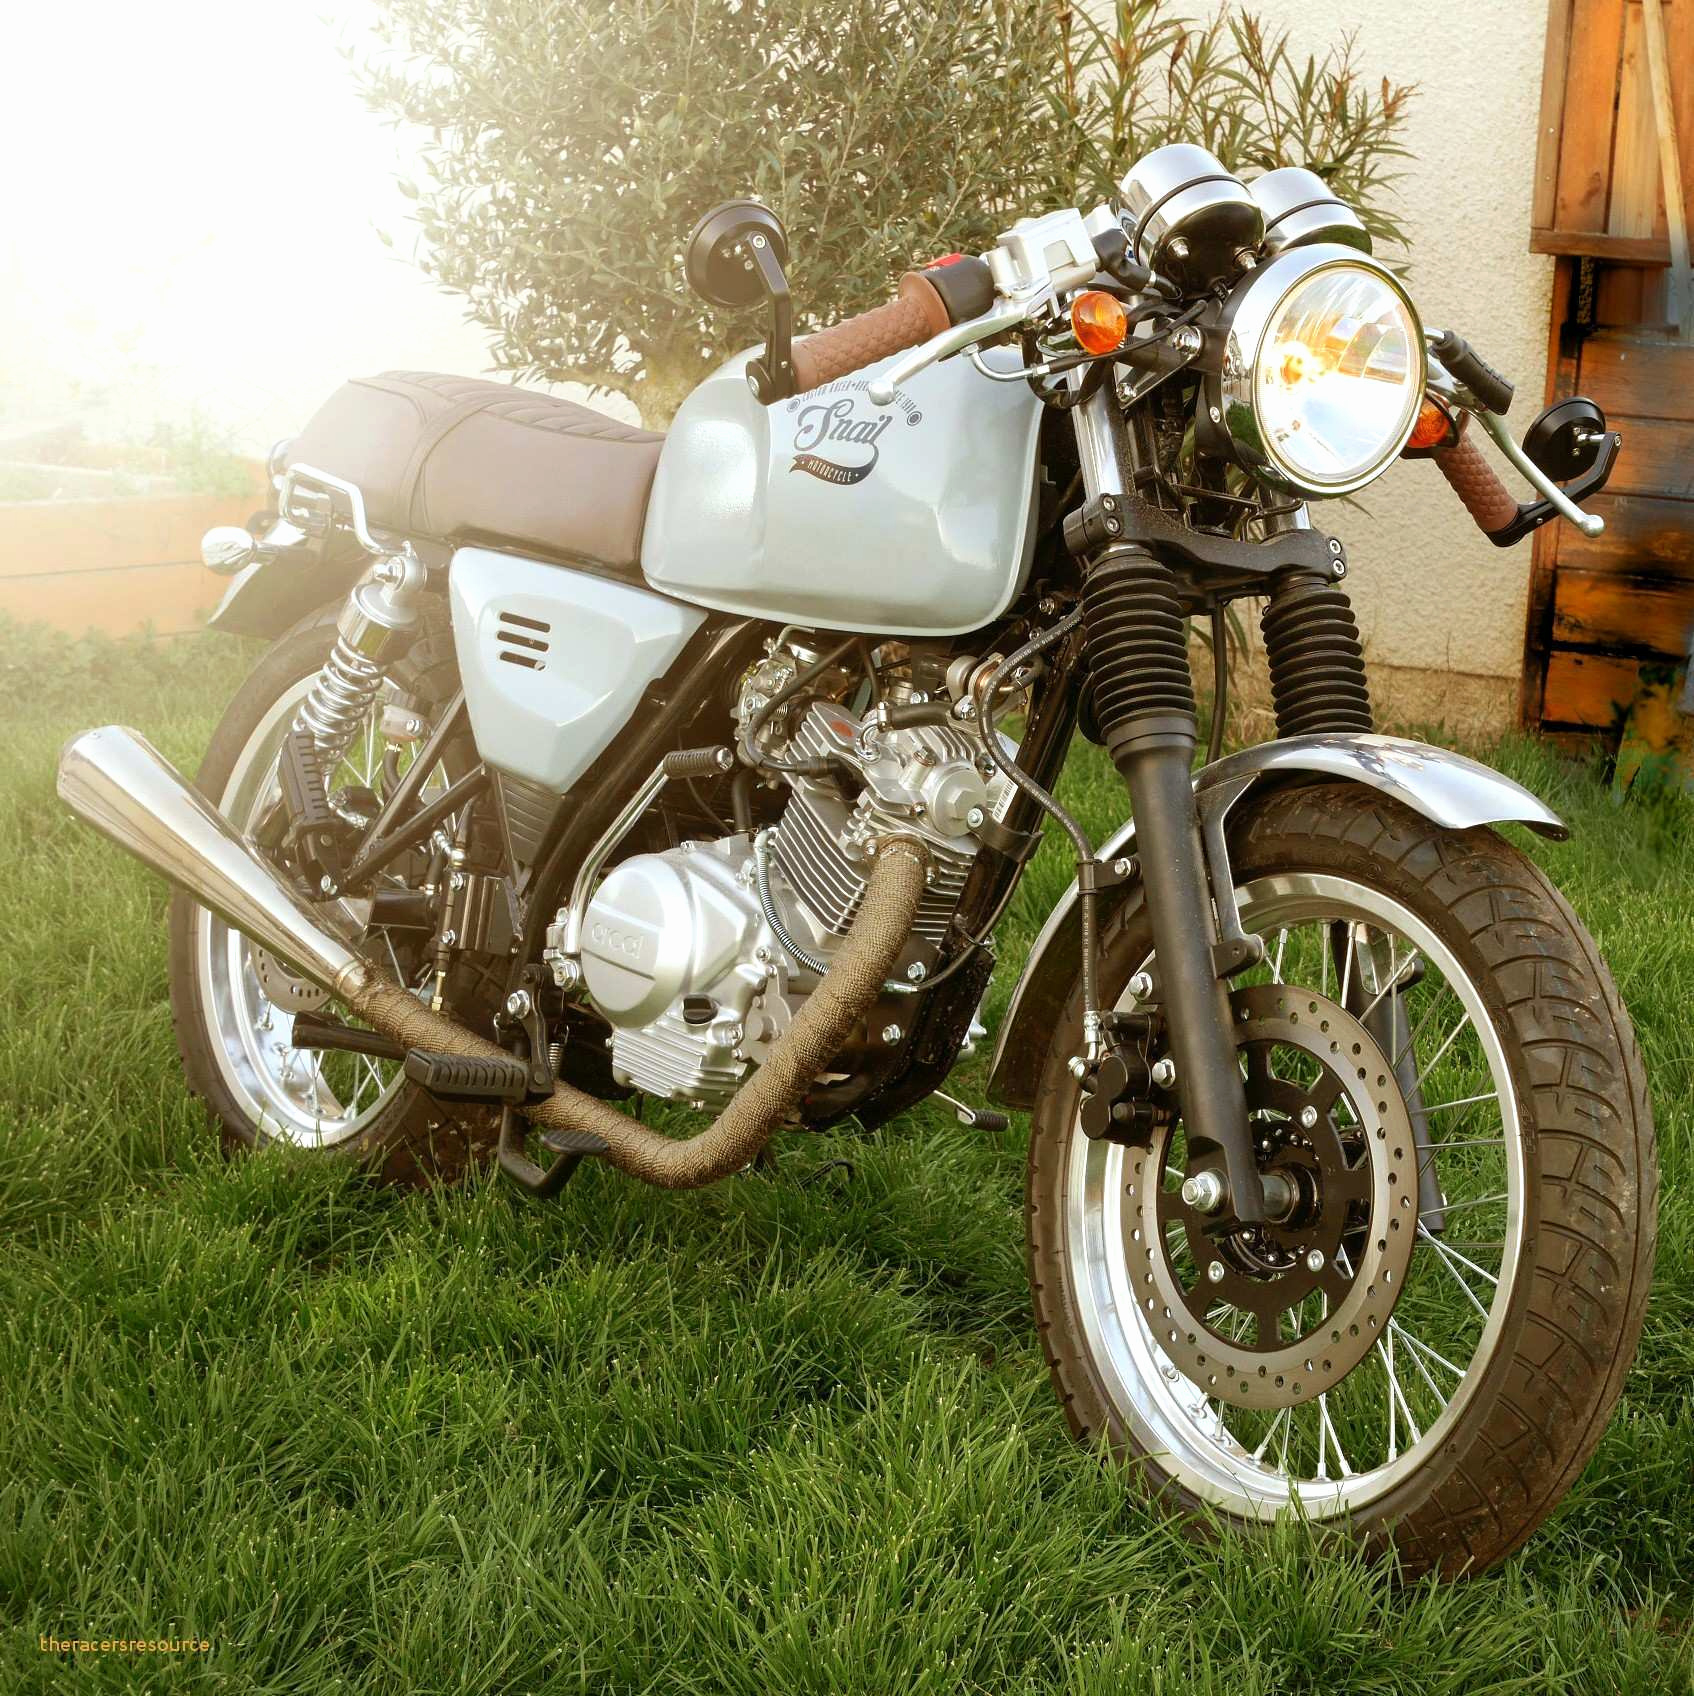 Garage: Garage Pour Moto pour Abri Moto Jardin